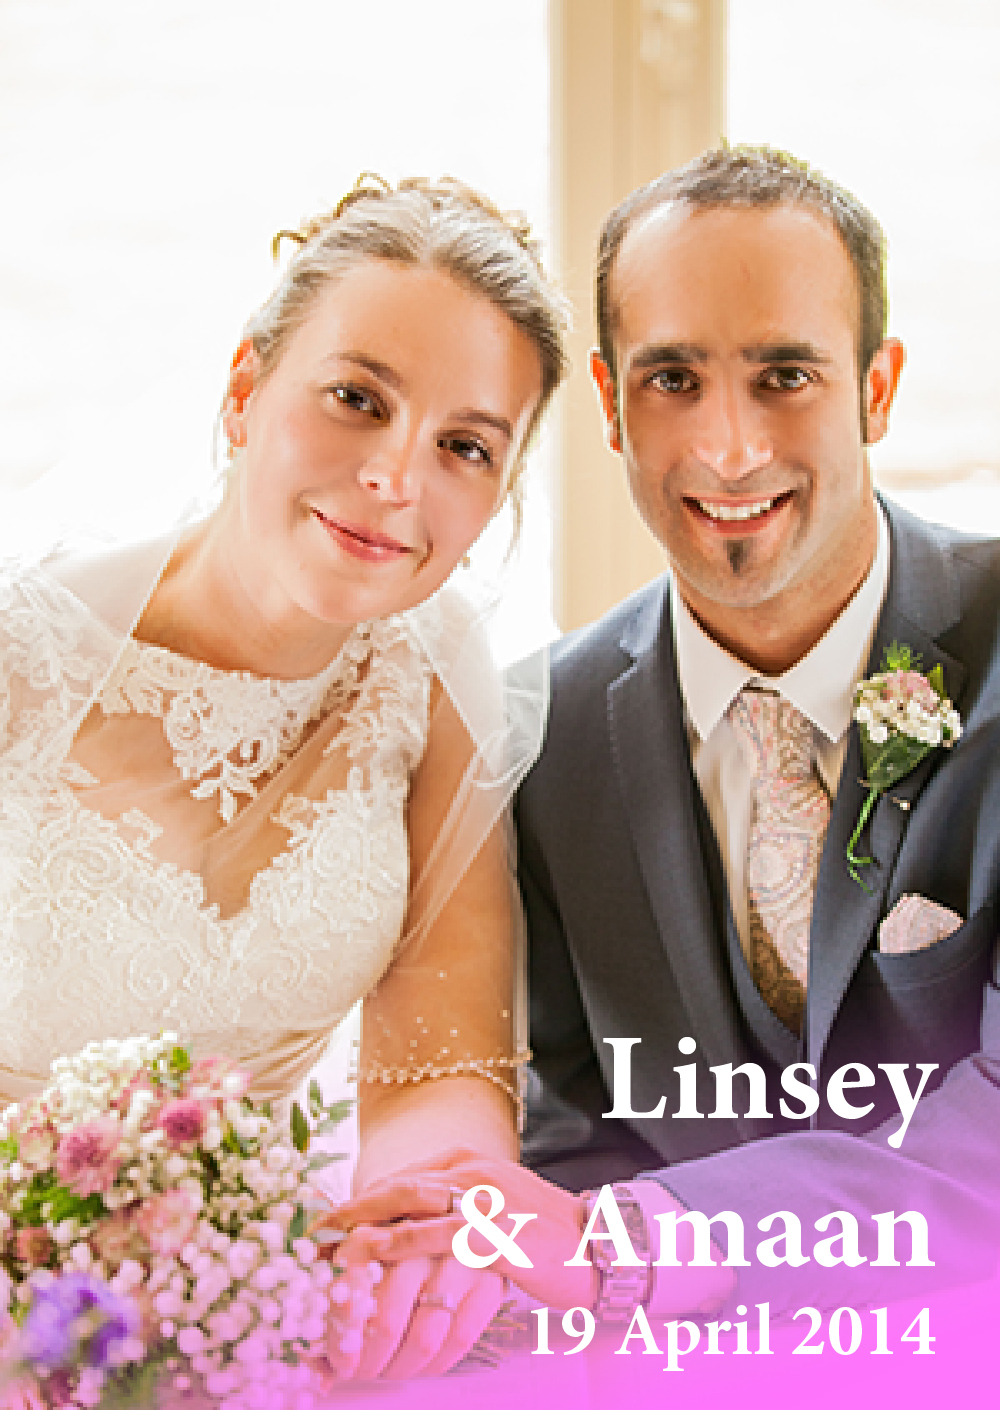 Linsey & Amaan's Wedding